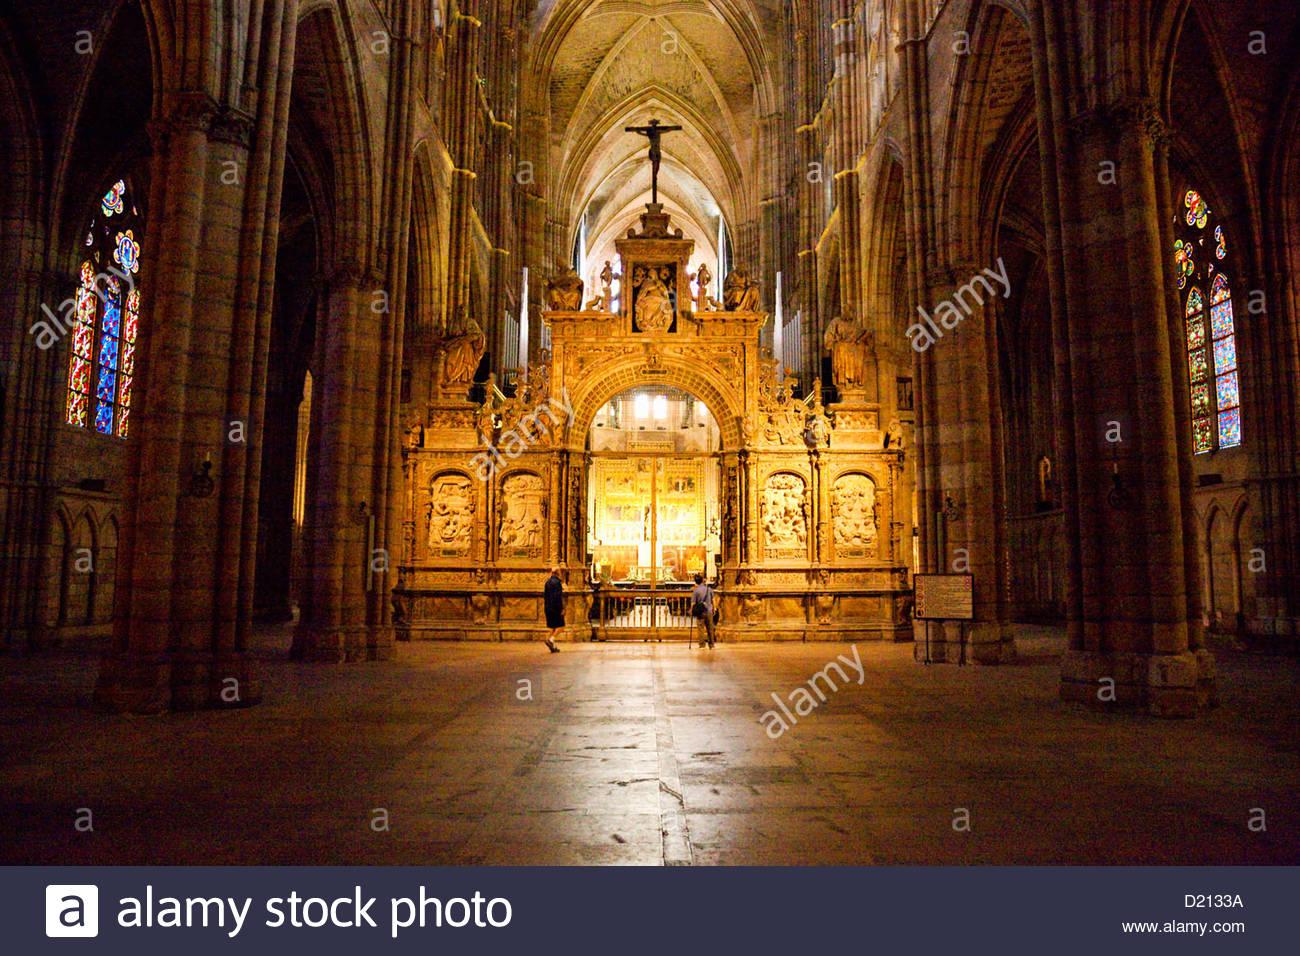 Inside Leon Cathedral, Leon, Castile-Leon, Spain - Stock Image